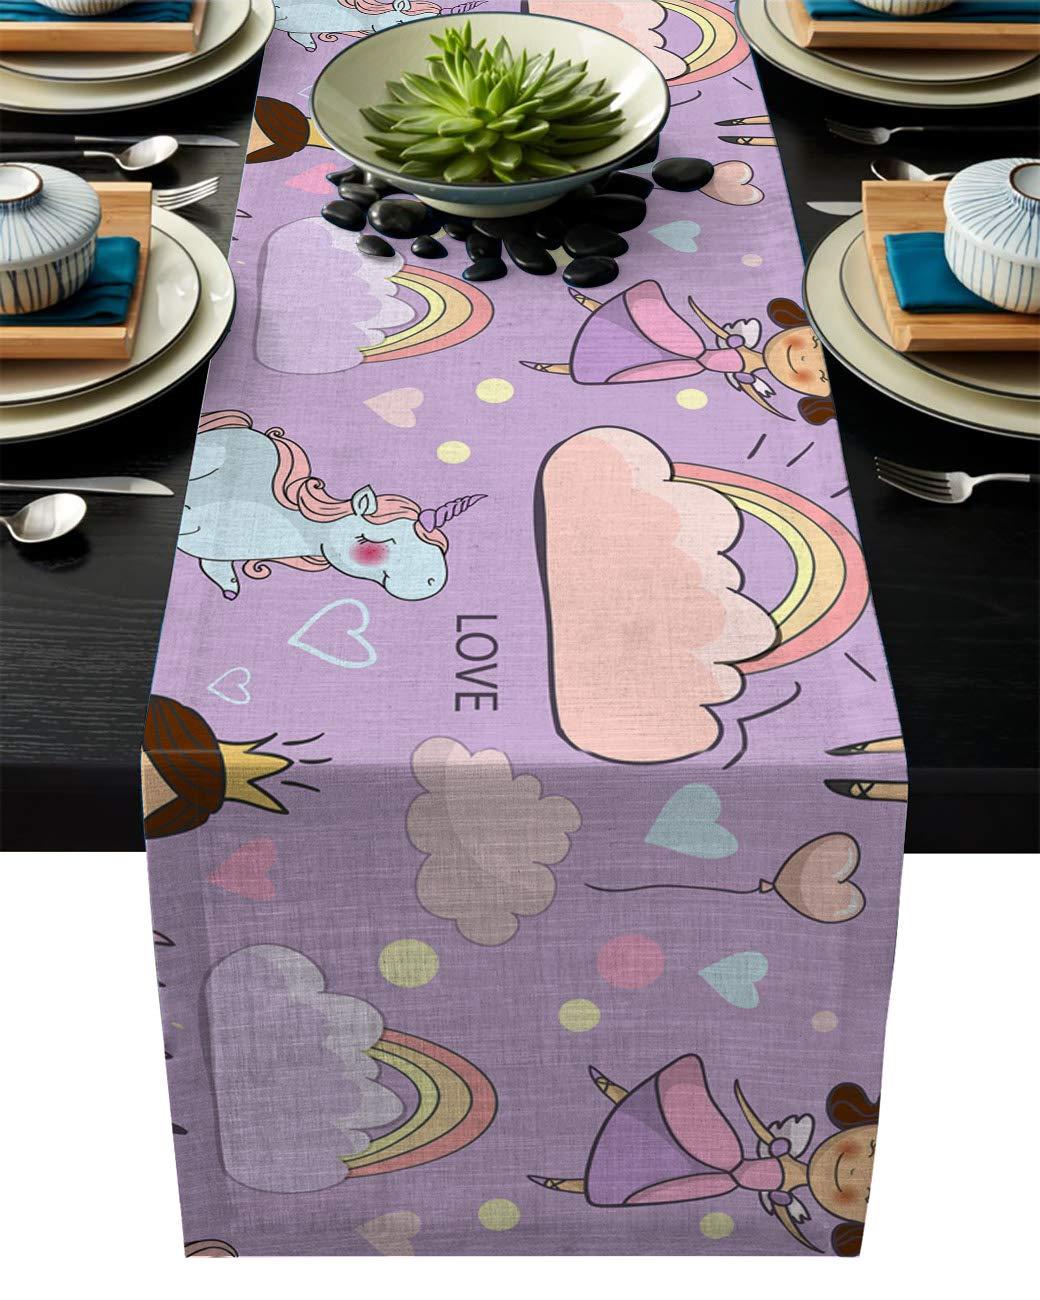 IDOWMAT Linen Burlap Table Runner Dresser Scarves 13 x 90 Inch, Cute Fairy Princess Unicorn Kitchen Table Runners for Farmhouse Dinner, Holiday Parties, Wedding, Events, Decor